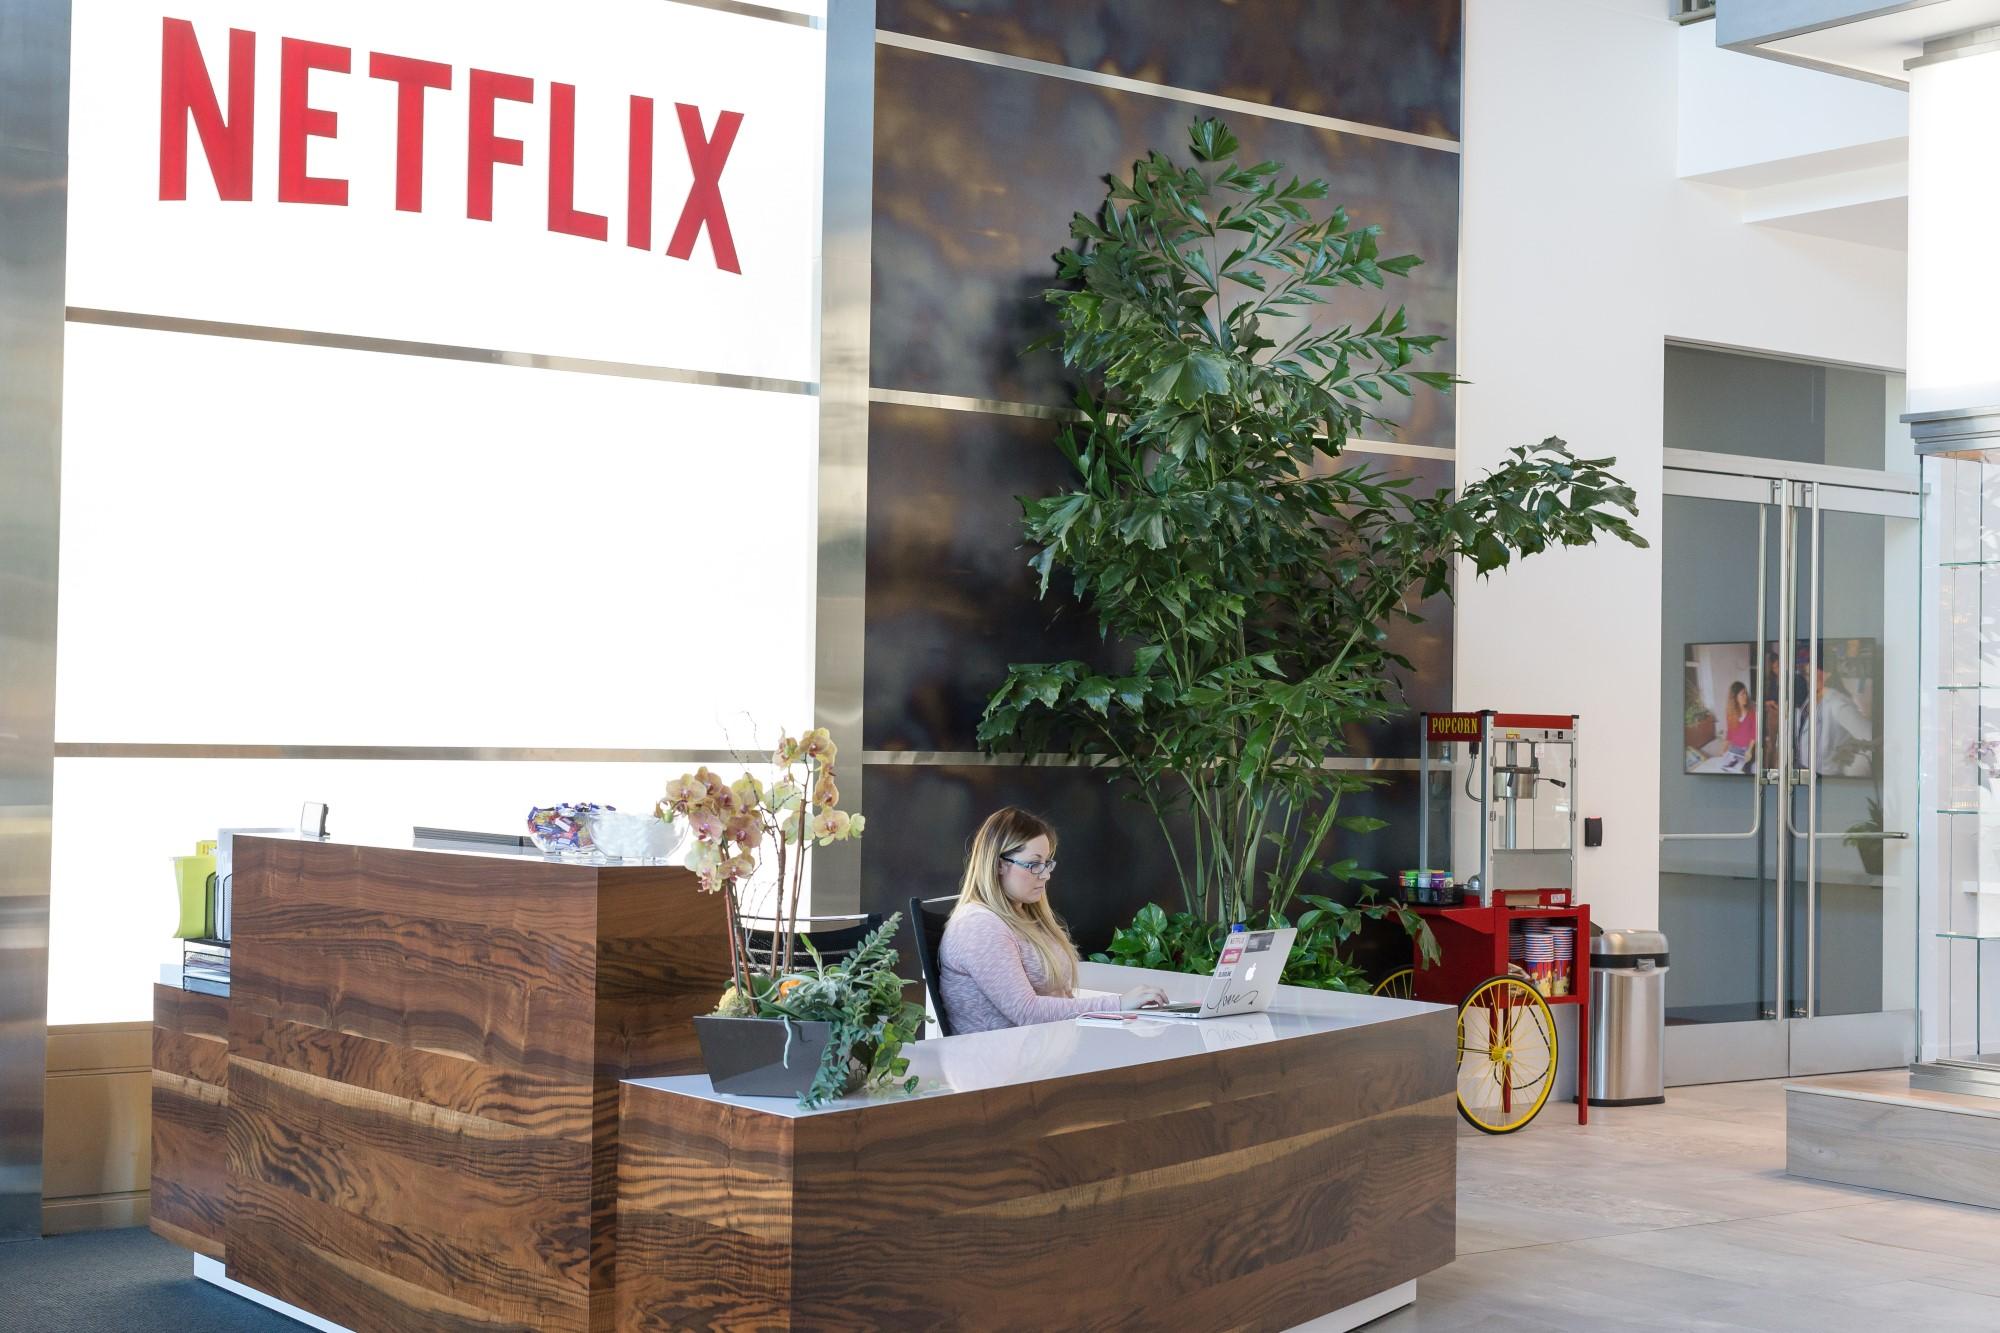 The Netflix logo inside the company's Los Gatos headquarters.